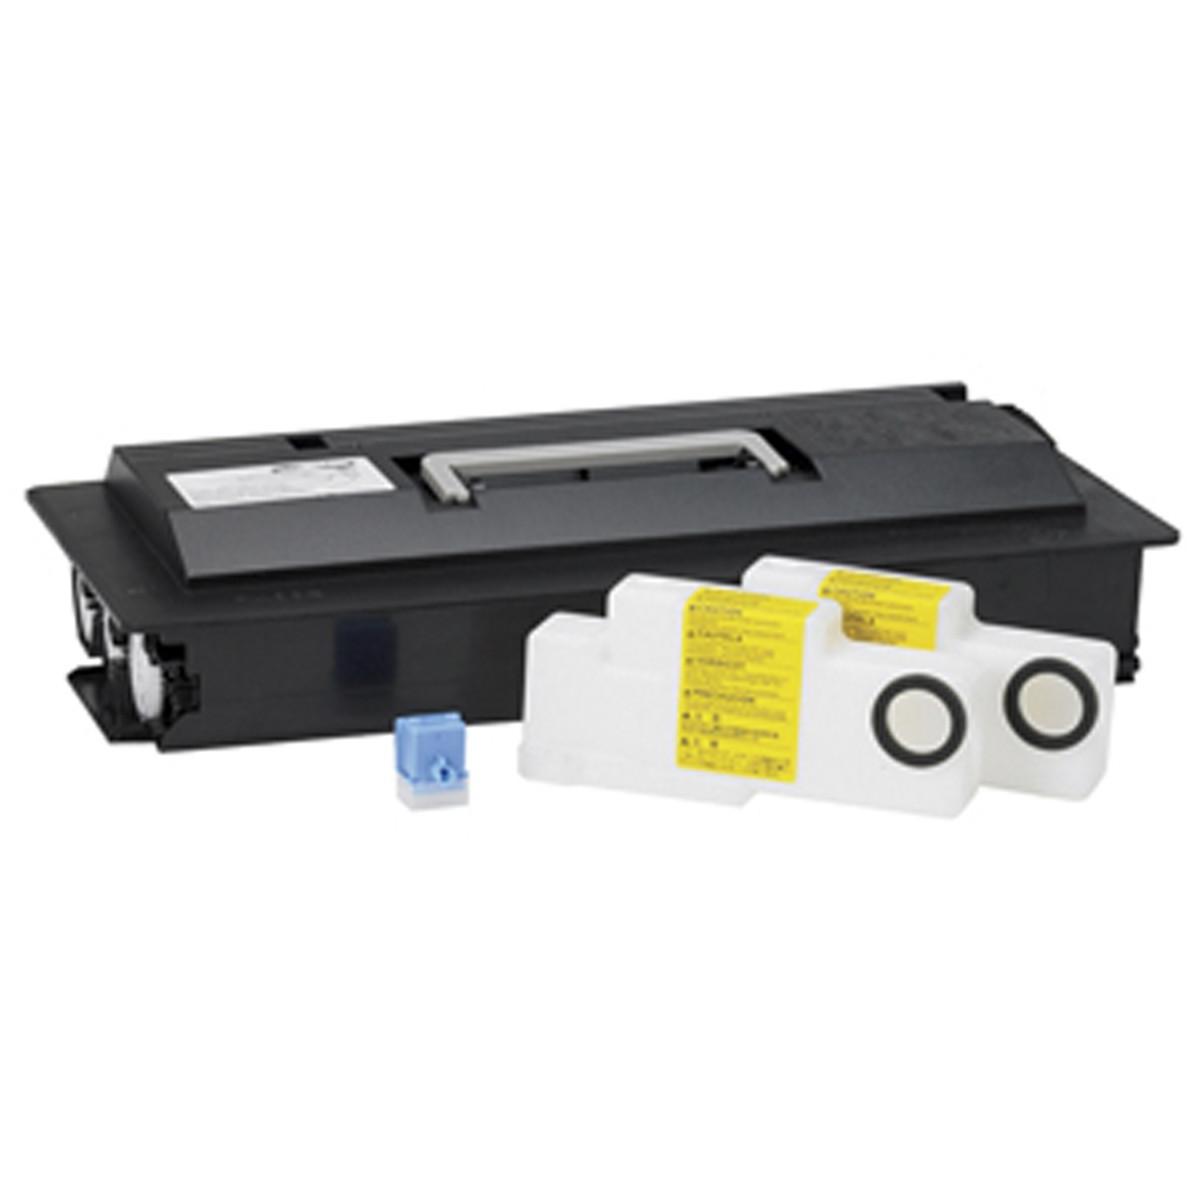 Toner Kyocera Mita 370AB011 370AB016 | KM2530 KM3035 KM3530 KM4030 KM4035 KM5035 | Katun Performance